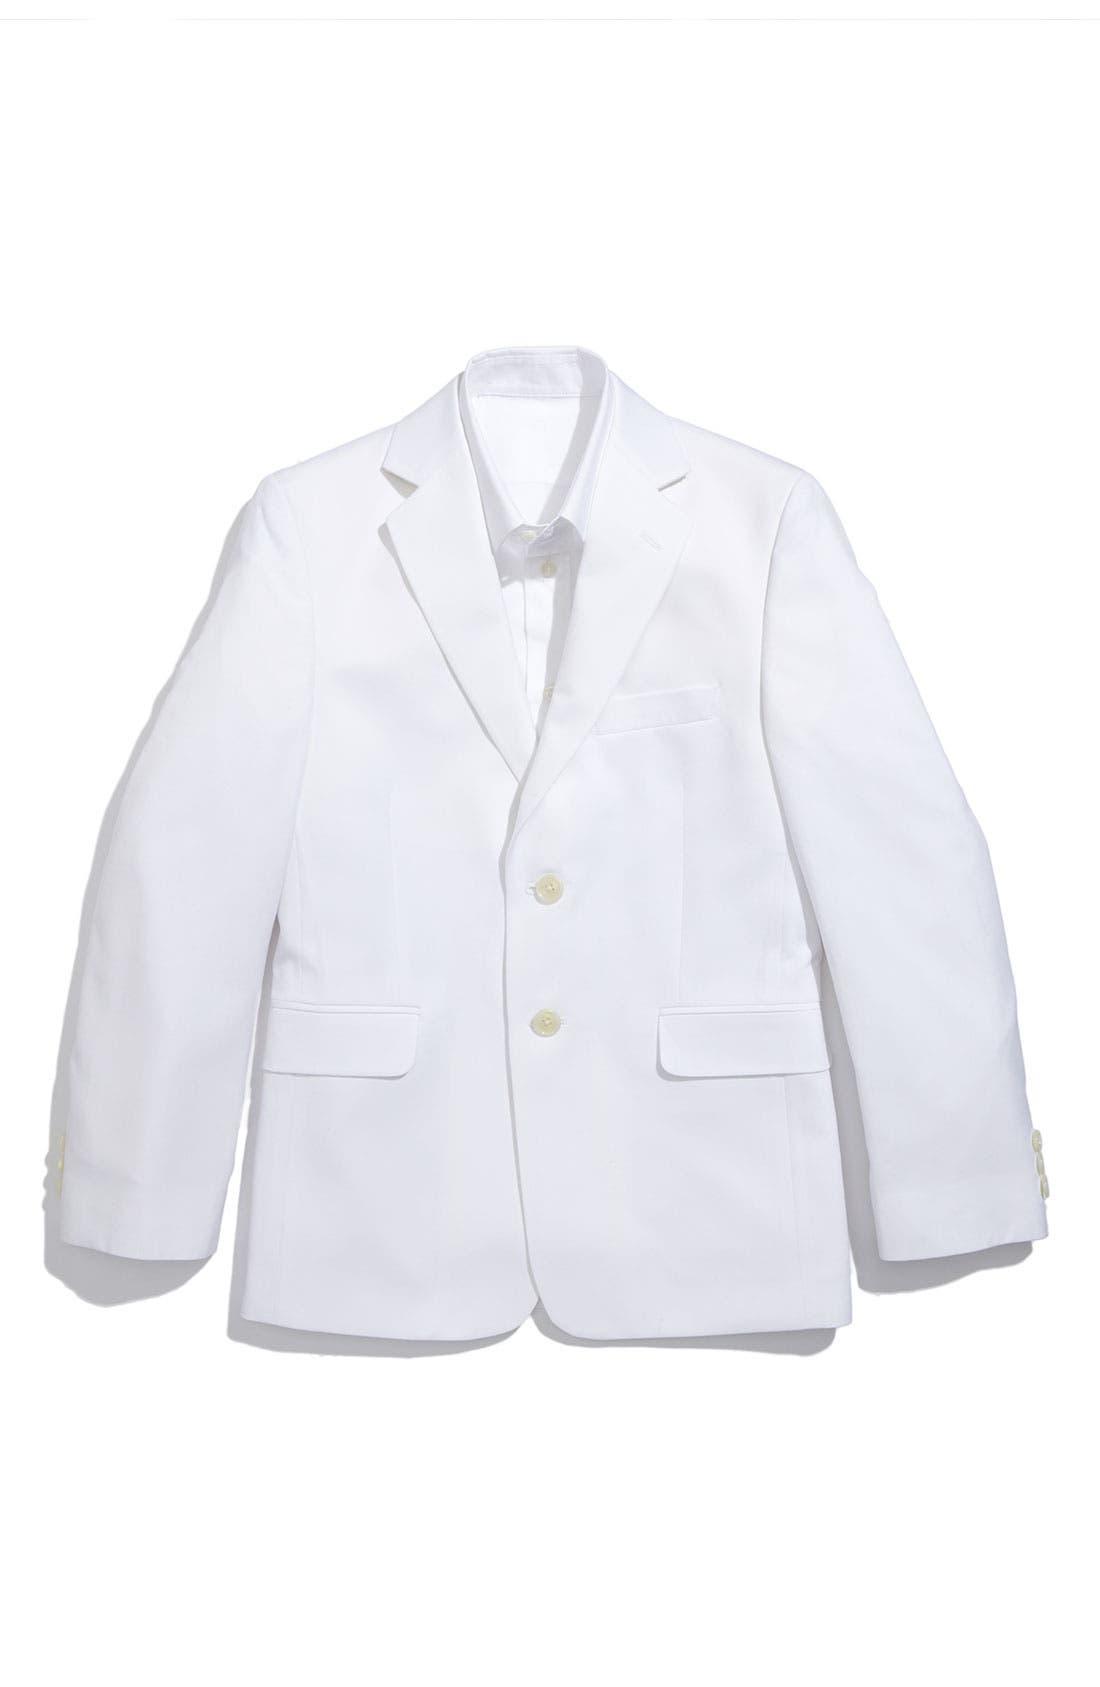 Alternate Image 1 Selected - Joseph Abboud Dress Jacket (Little Boys, Big Boys & Husky)